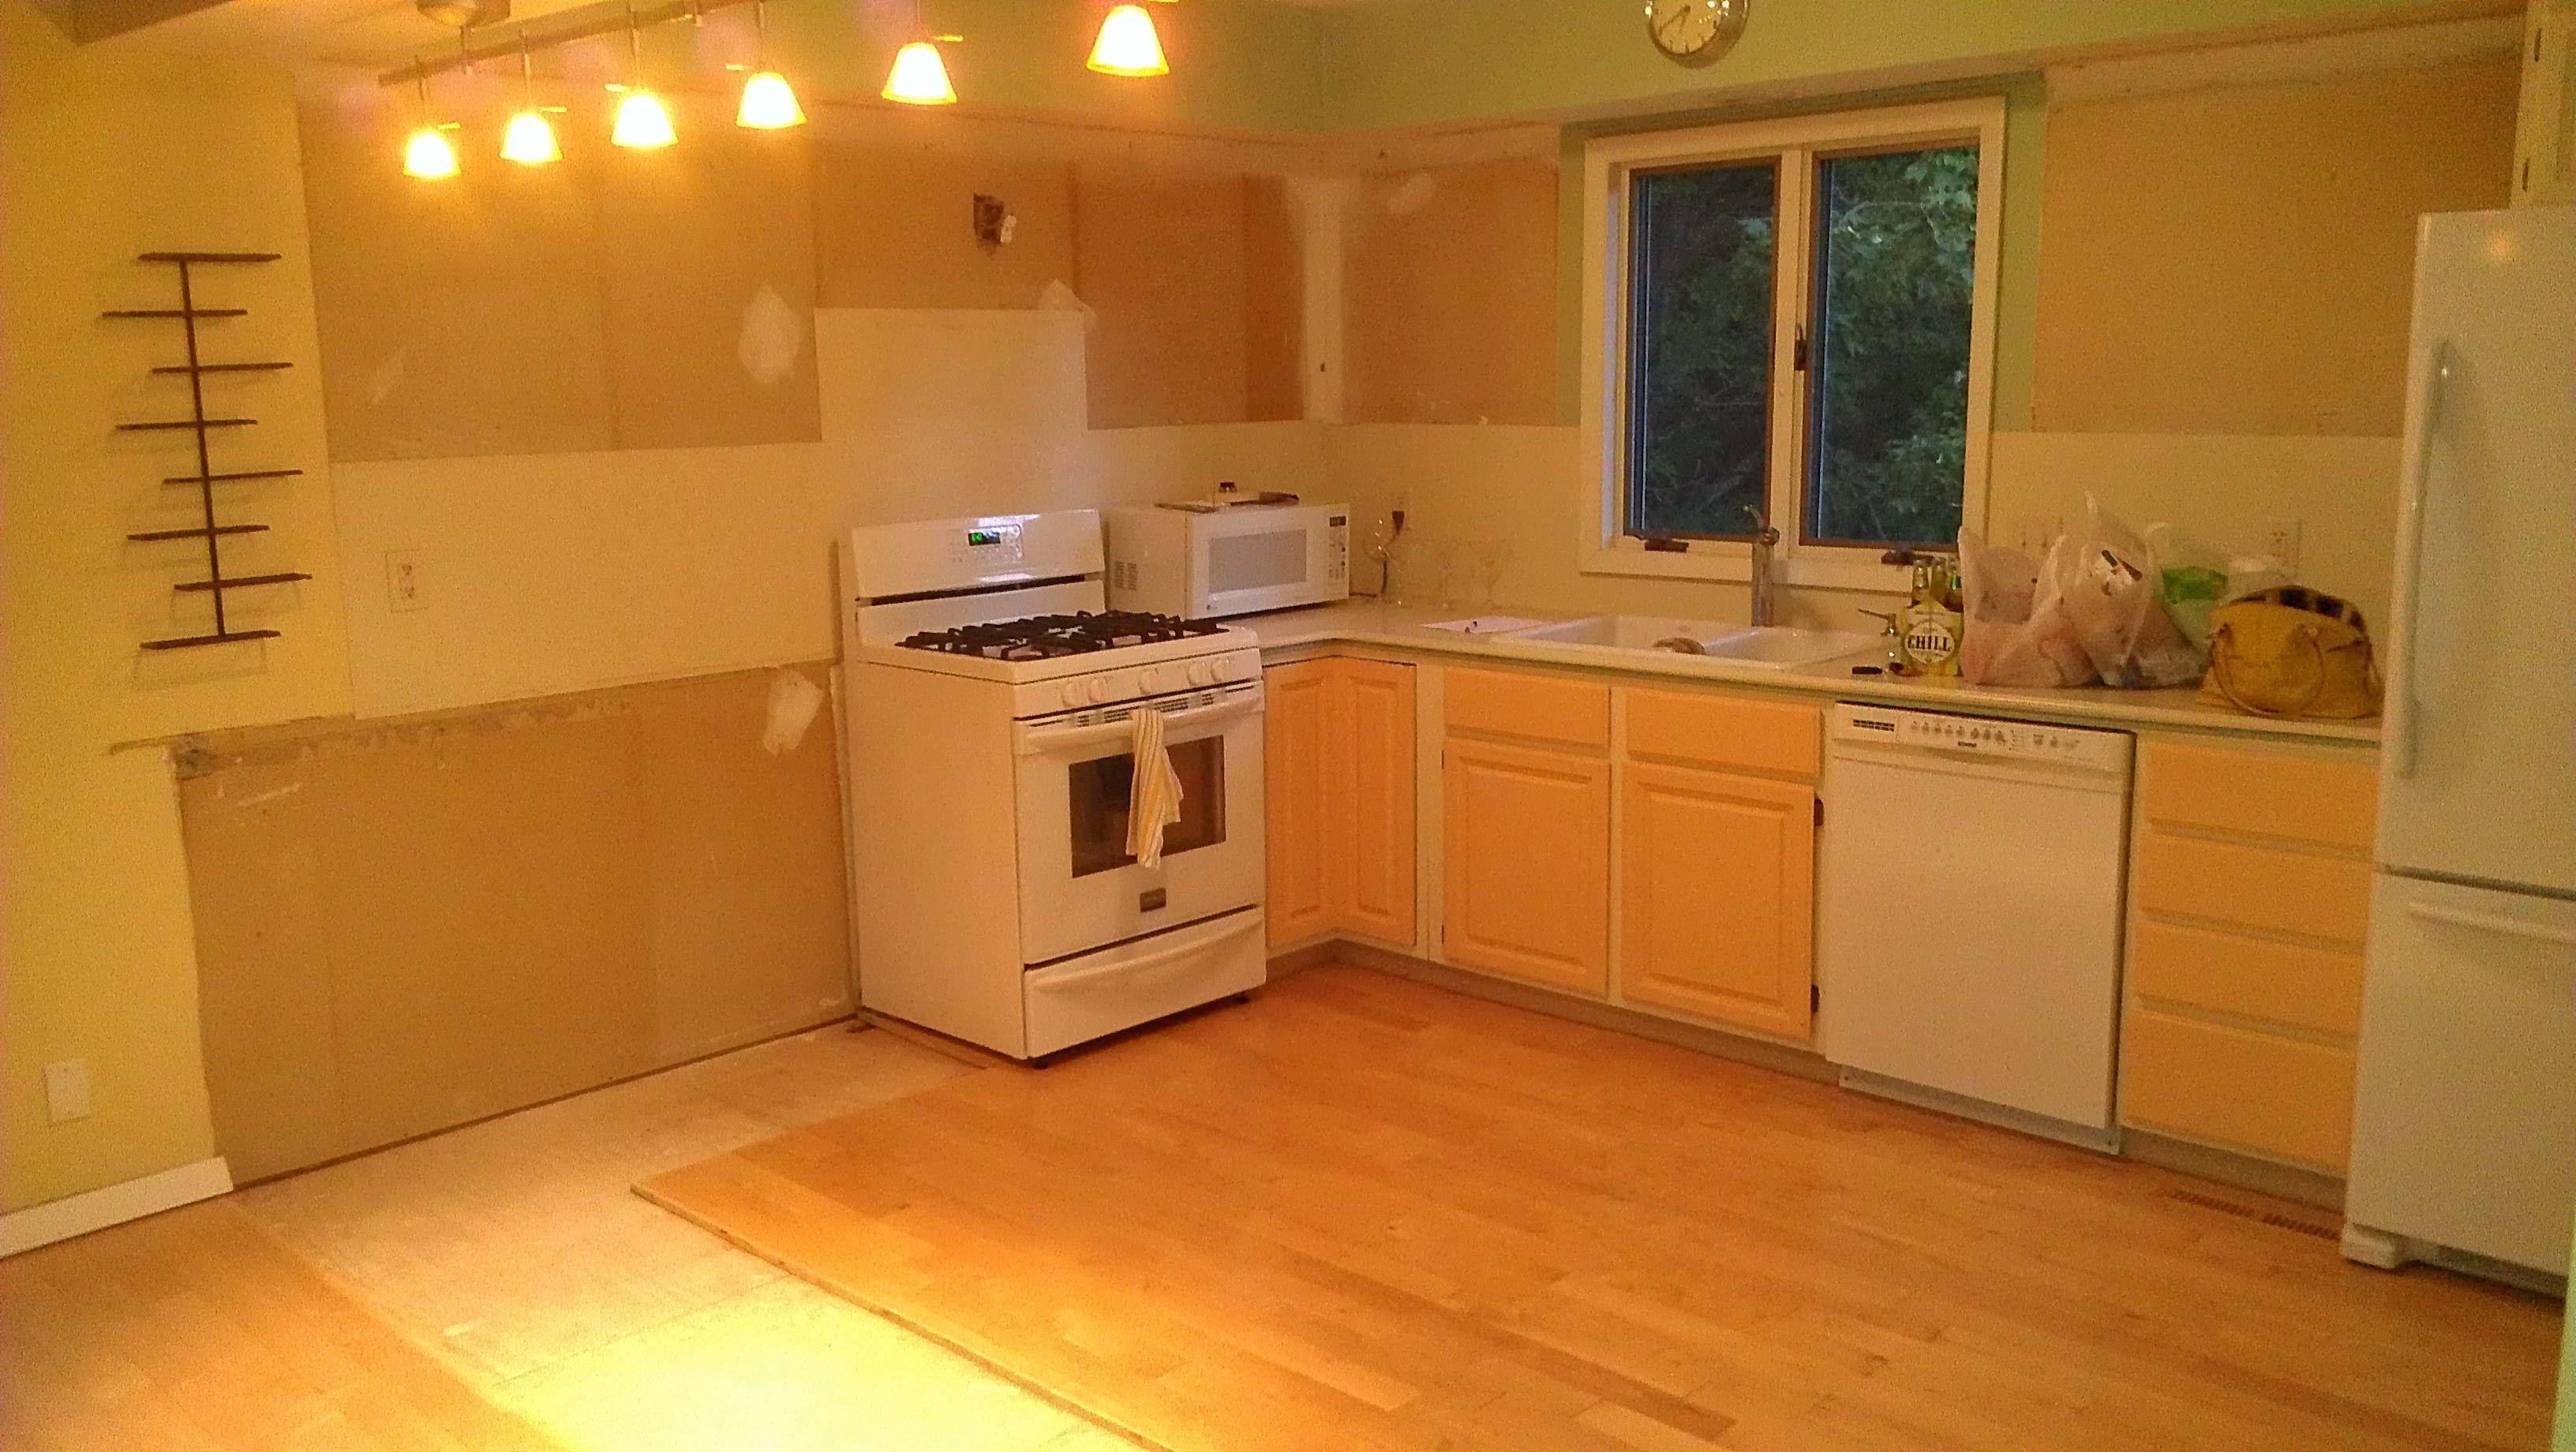 Before Partially Demolished Kitchen Kitchen Remodel Kitchen Cabinets